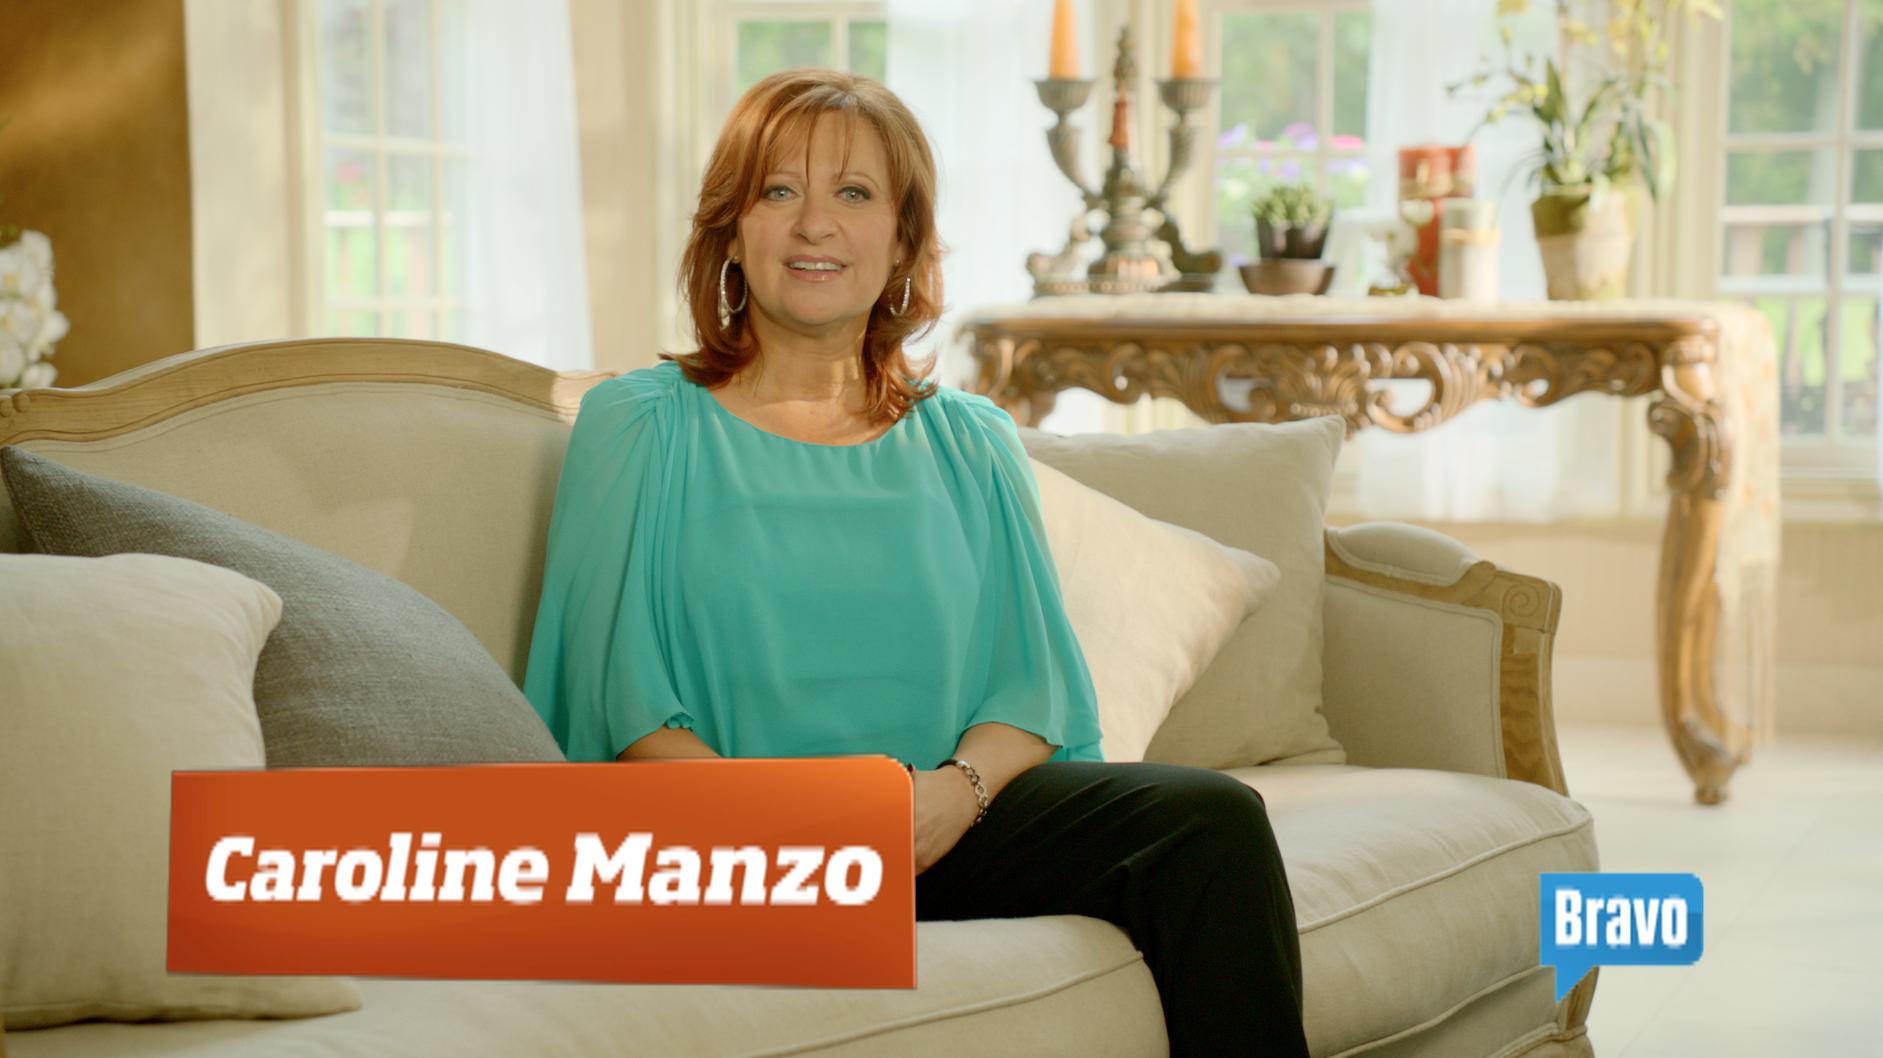 Bravo - People Like Us - Caroline Manzo 1883x1058.png